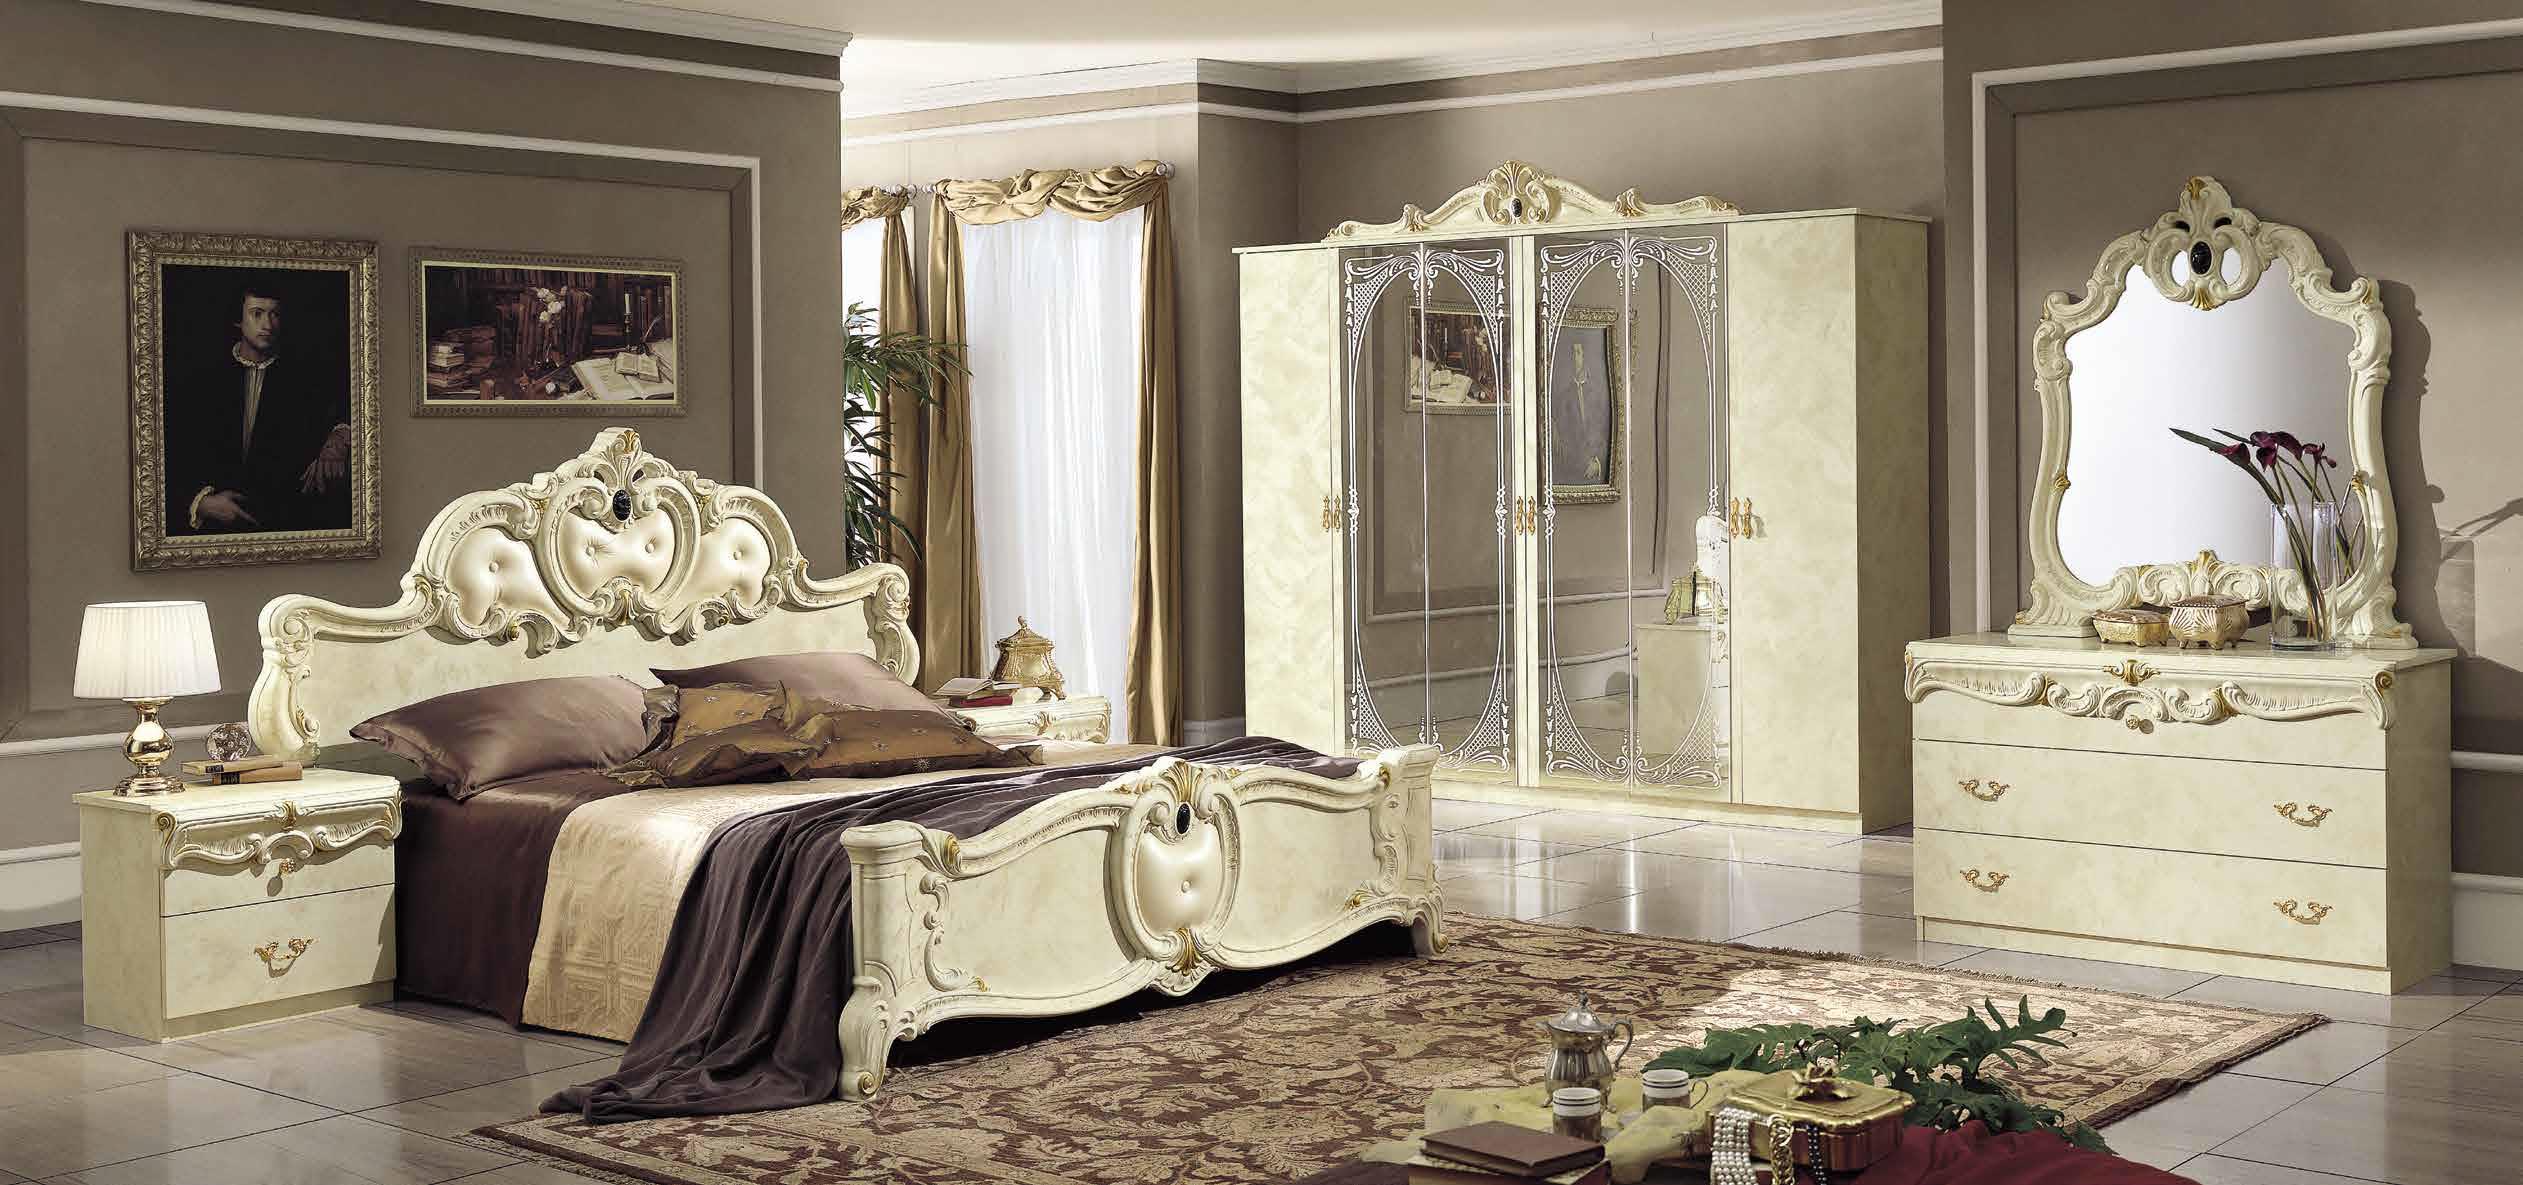 barocco ivory schlafzimmer yuvam m belhaus in wuppertal. Black Bedroom Furniture Sets. Home Design Ideas